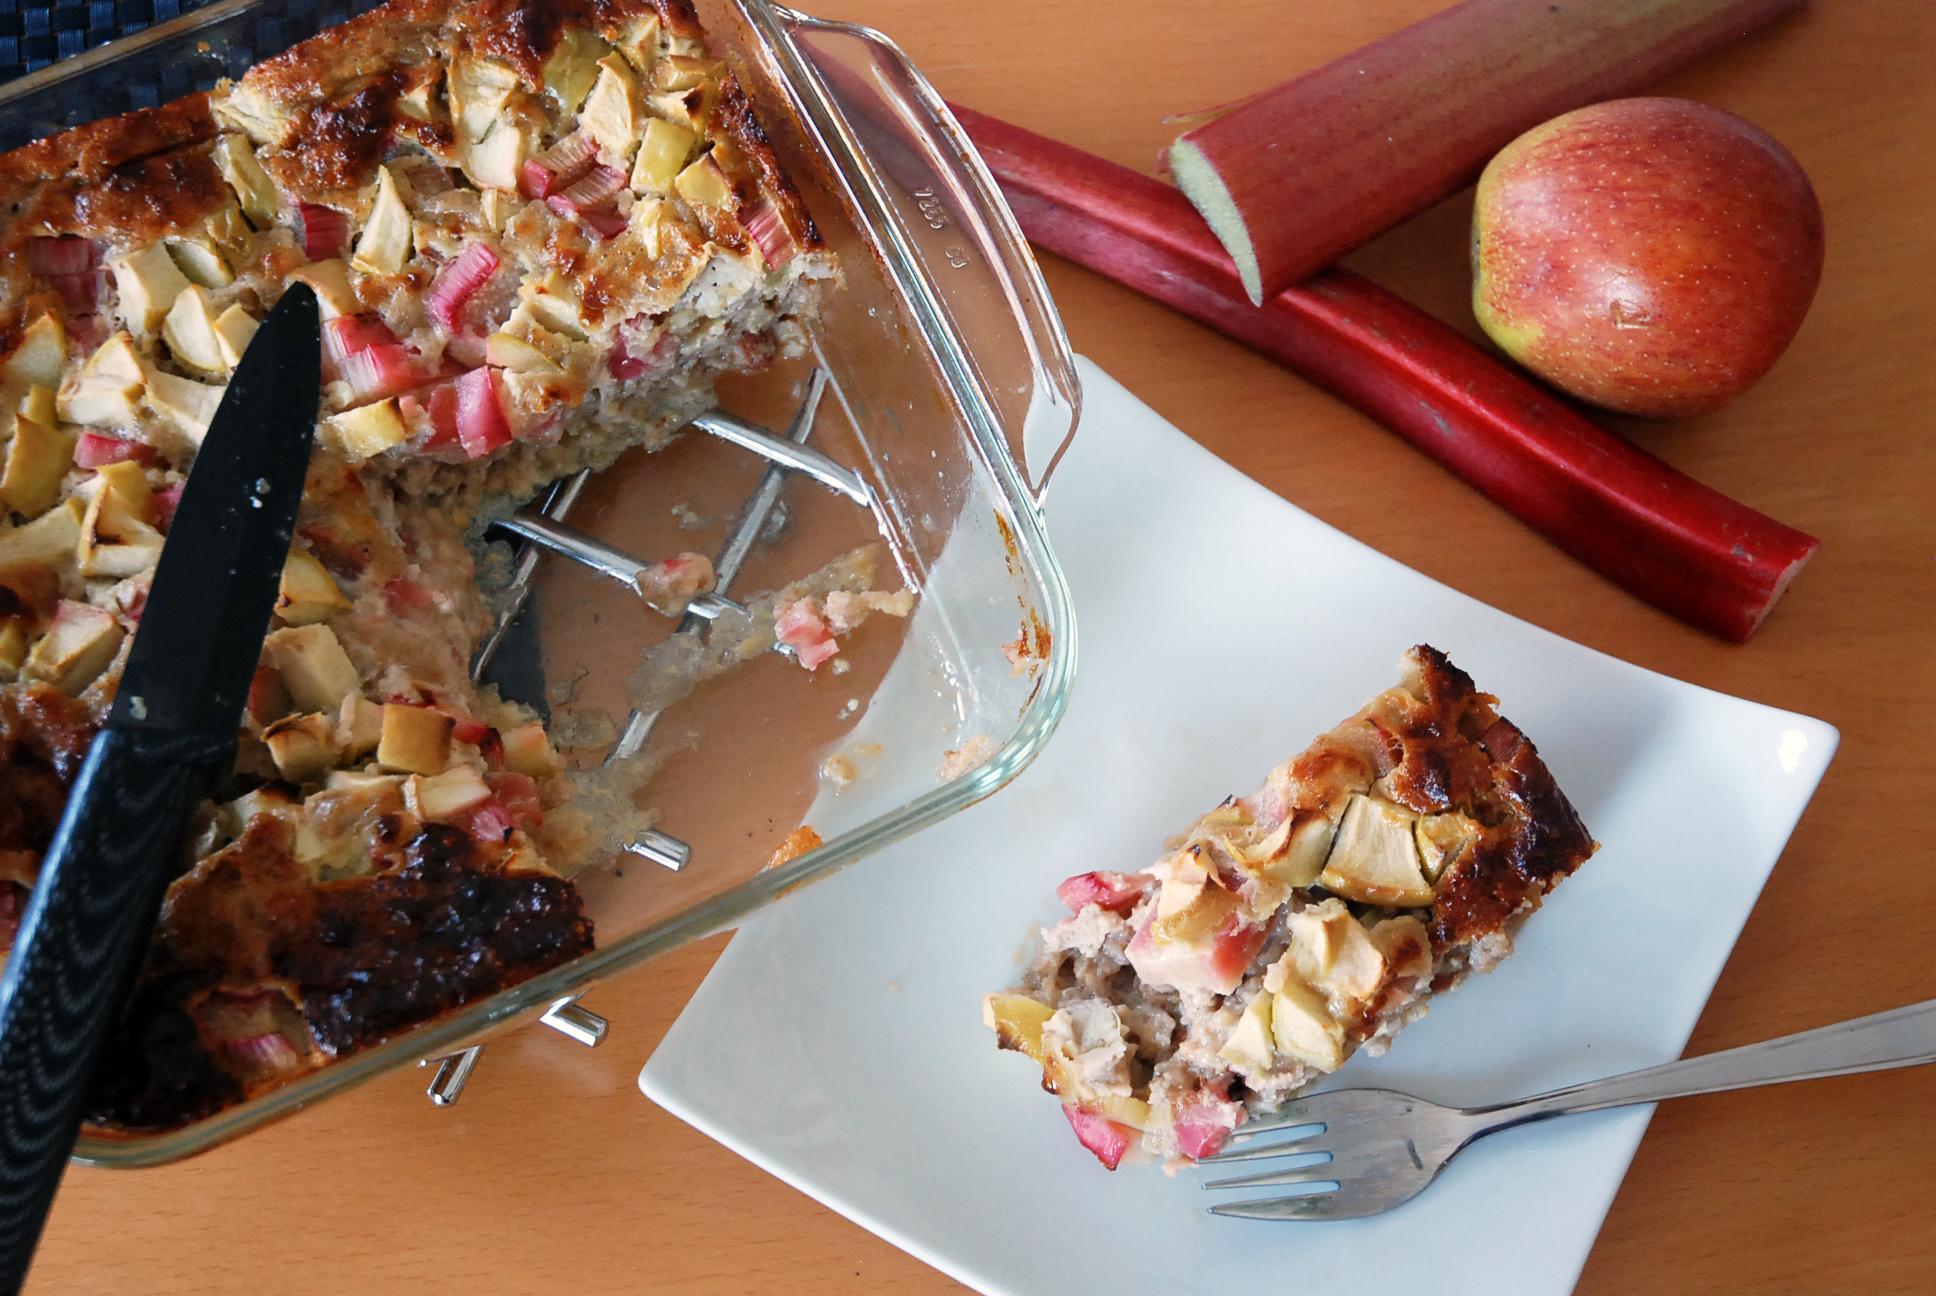 Rhabarber-Honig-Kuchen / Rhubarb-Honey-Cake